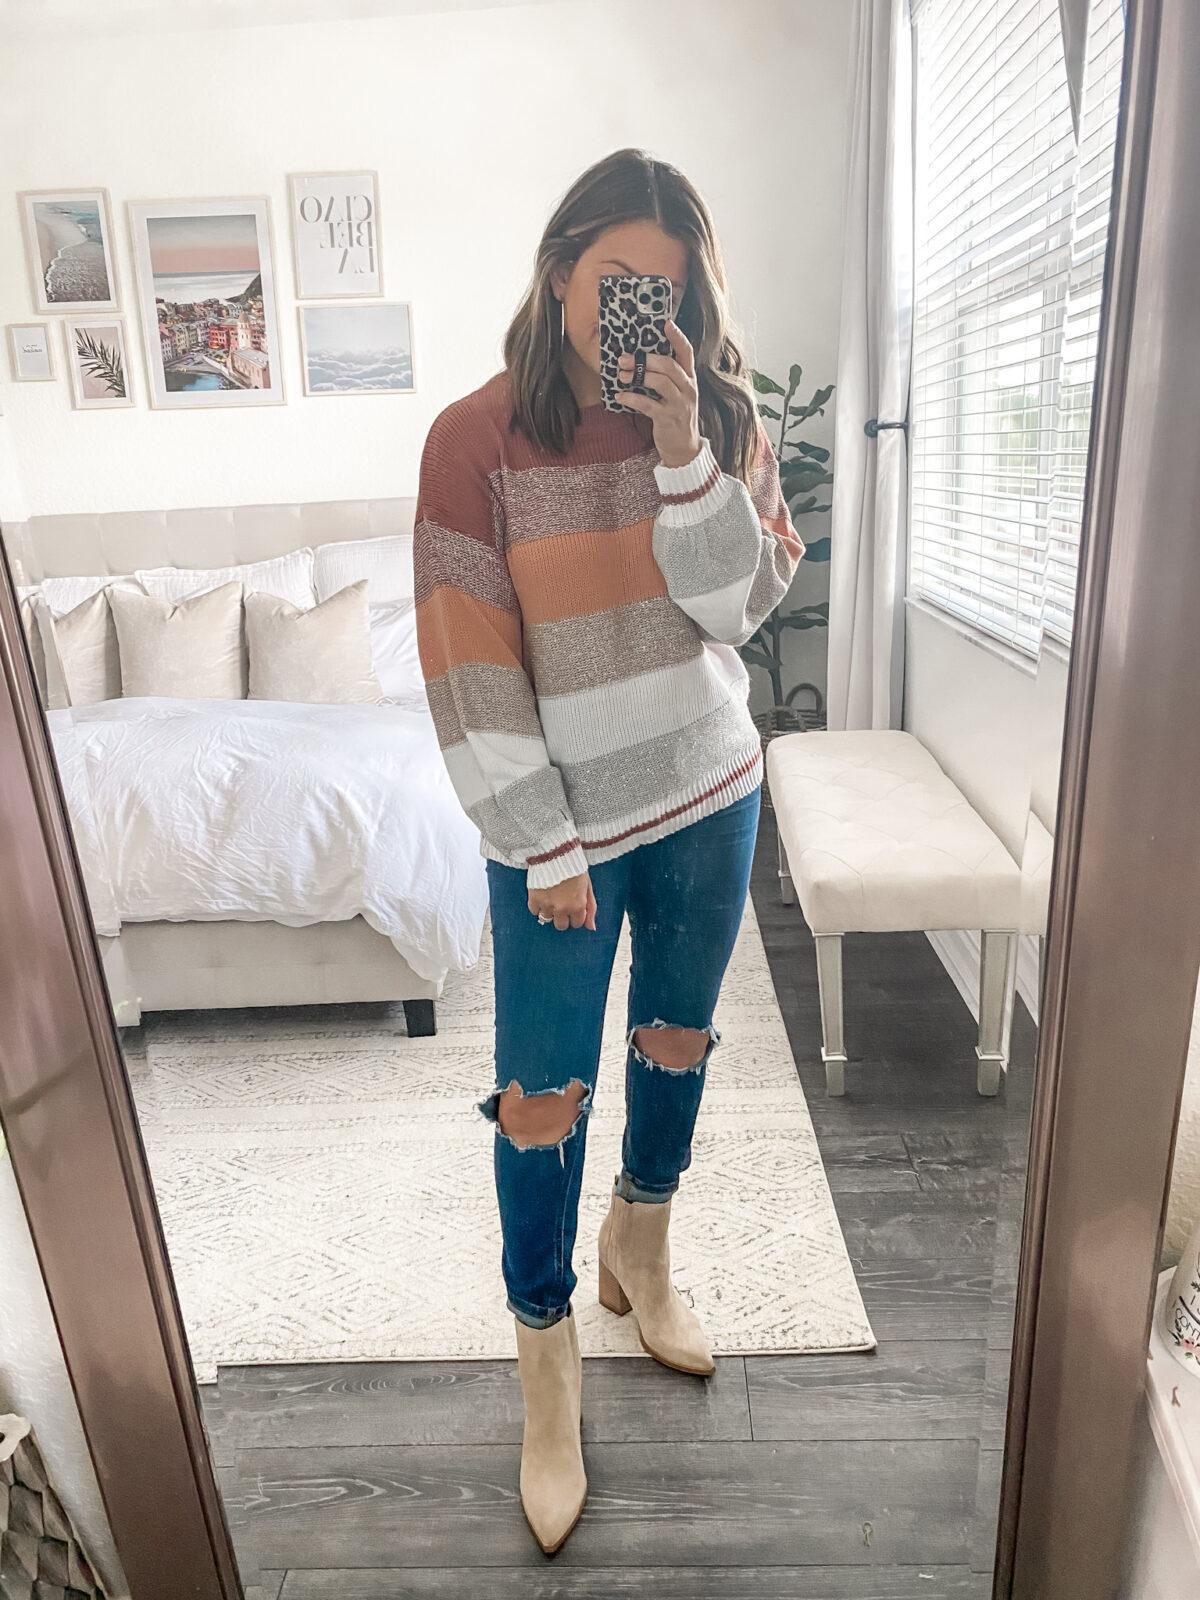 Amazon striped sweater, oversize stripe sweater from Amazon fashion, Florida blogger Jaime Cittadino of Sunflowers and Stilettos